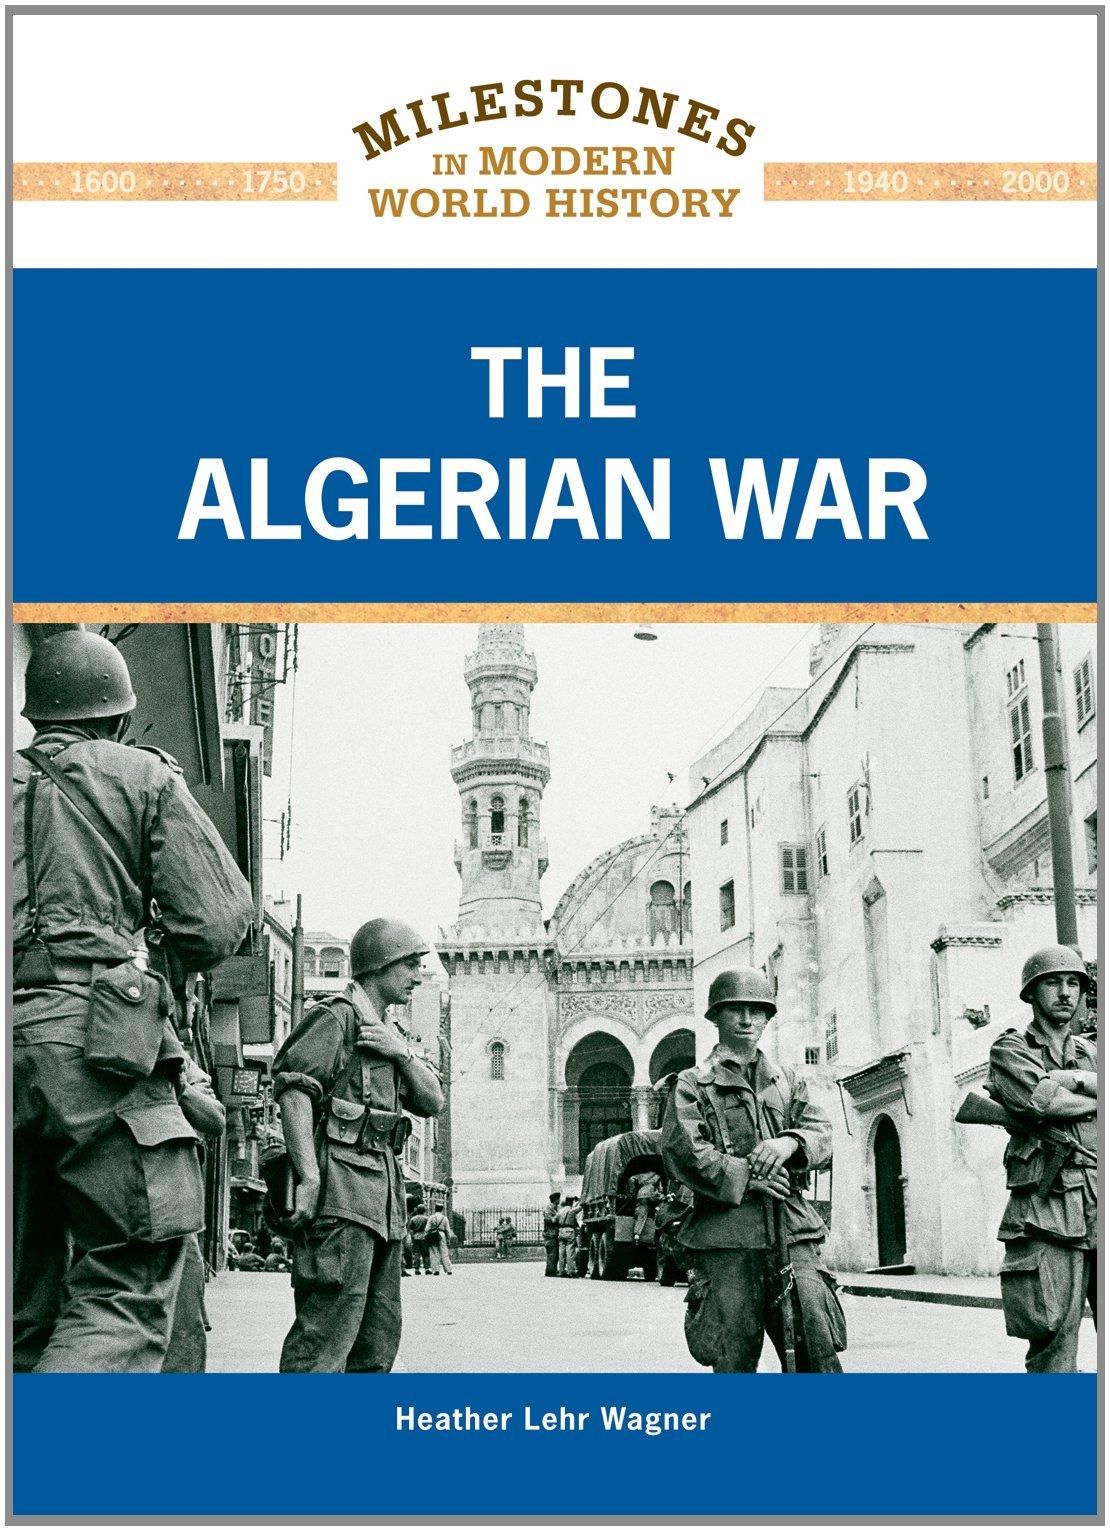 Download The Algerian War (Milestones in Modern World History) PDF